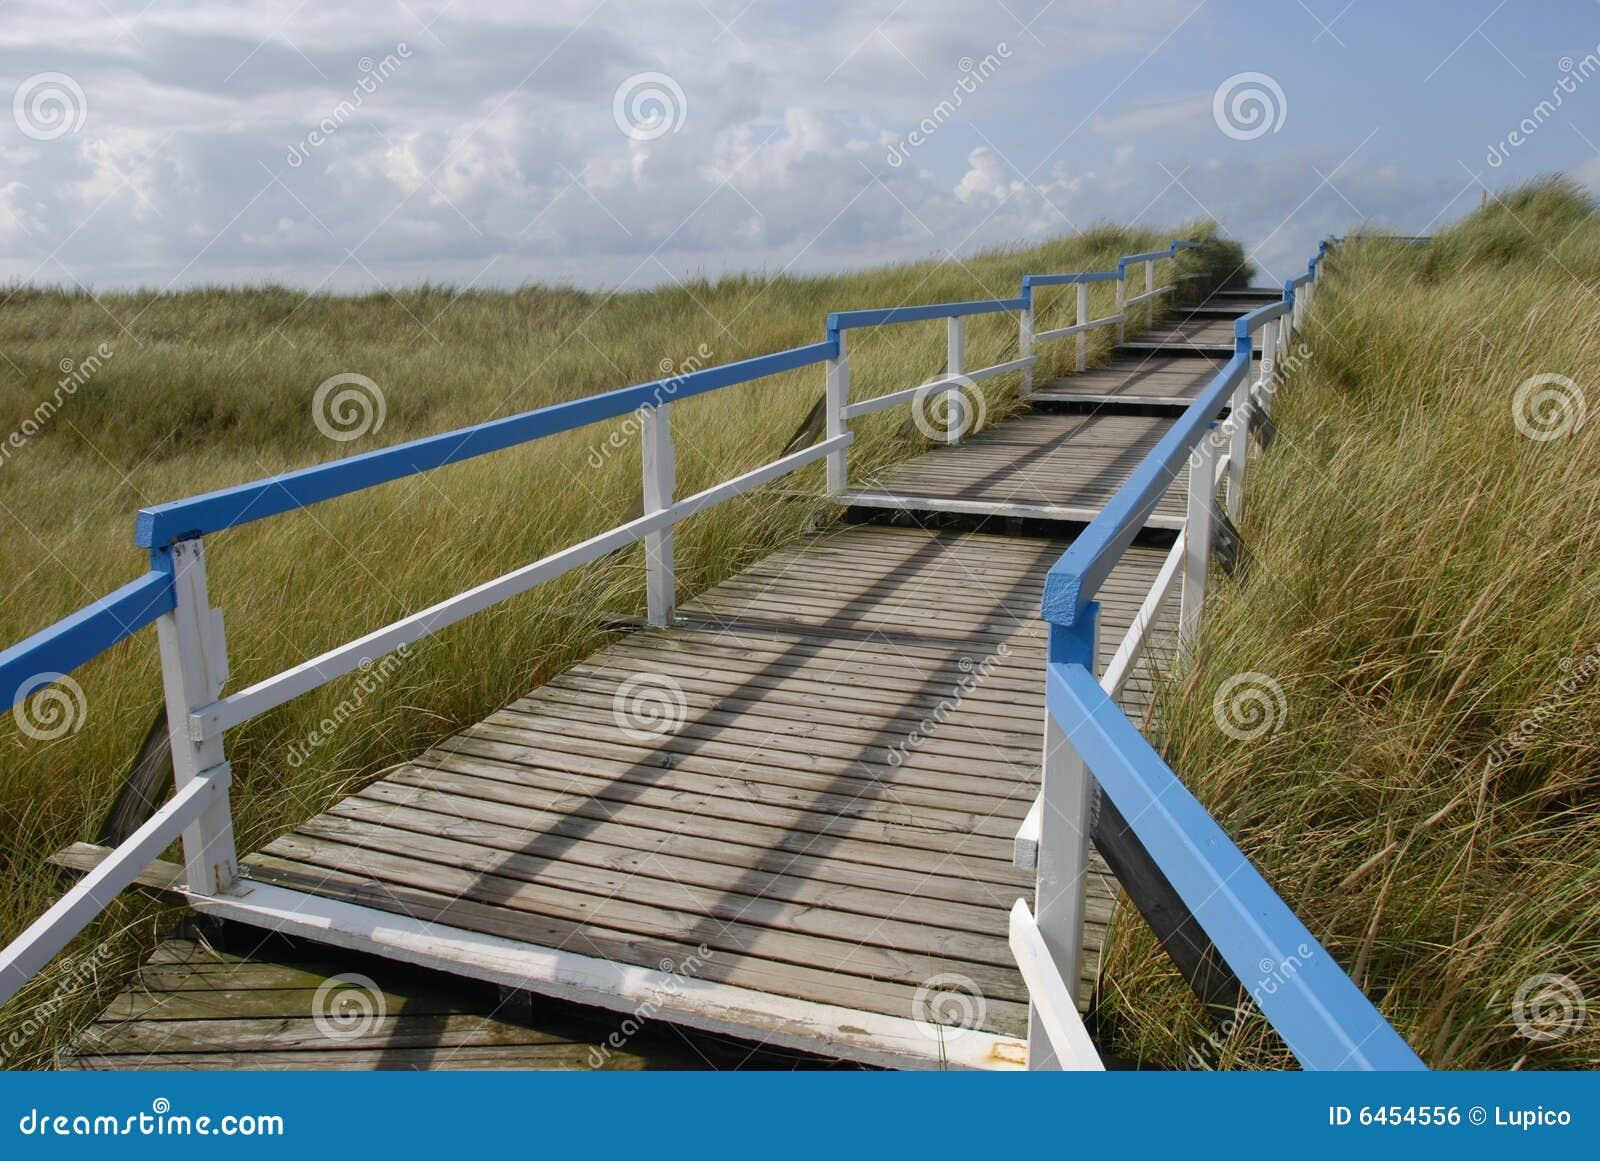 Beach entrance via wooden walkway